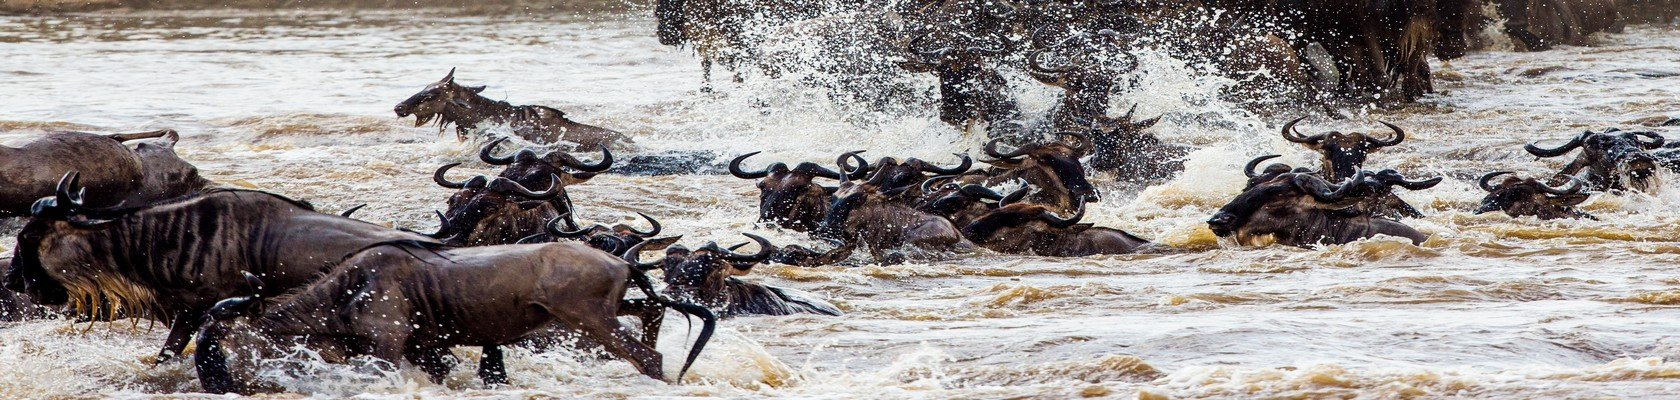 Masai Mara nationaal park